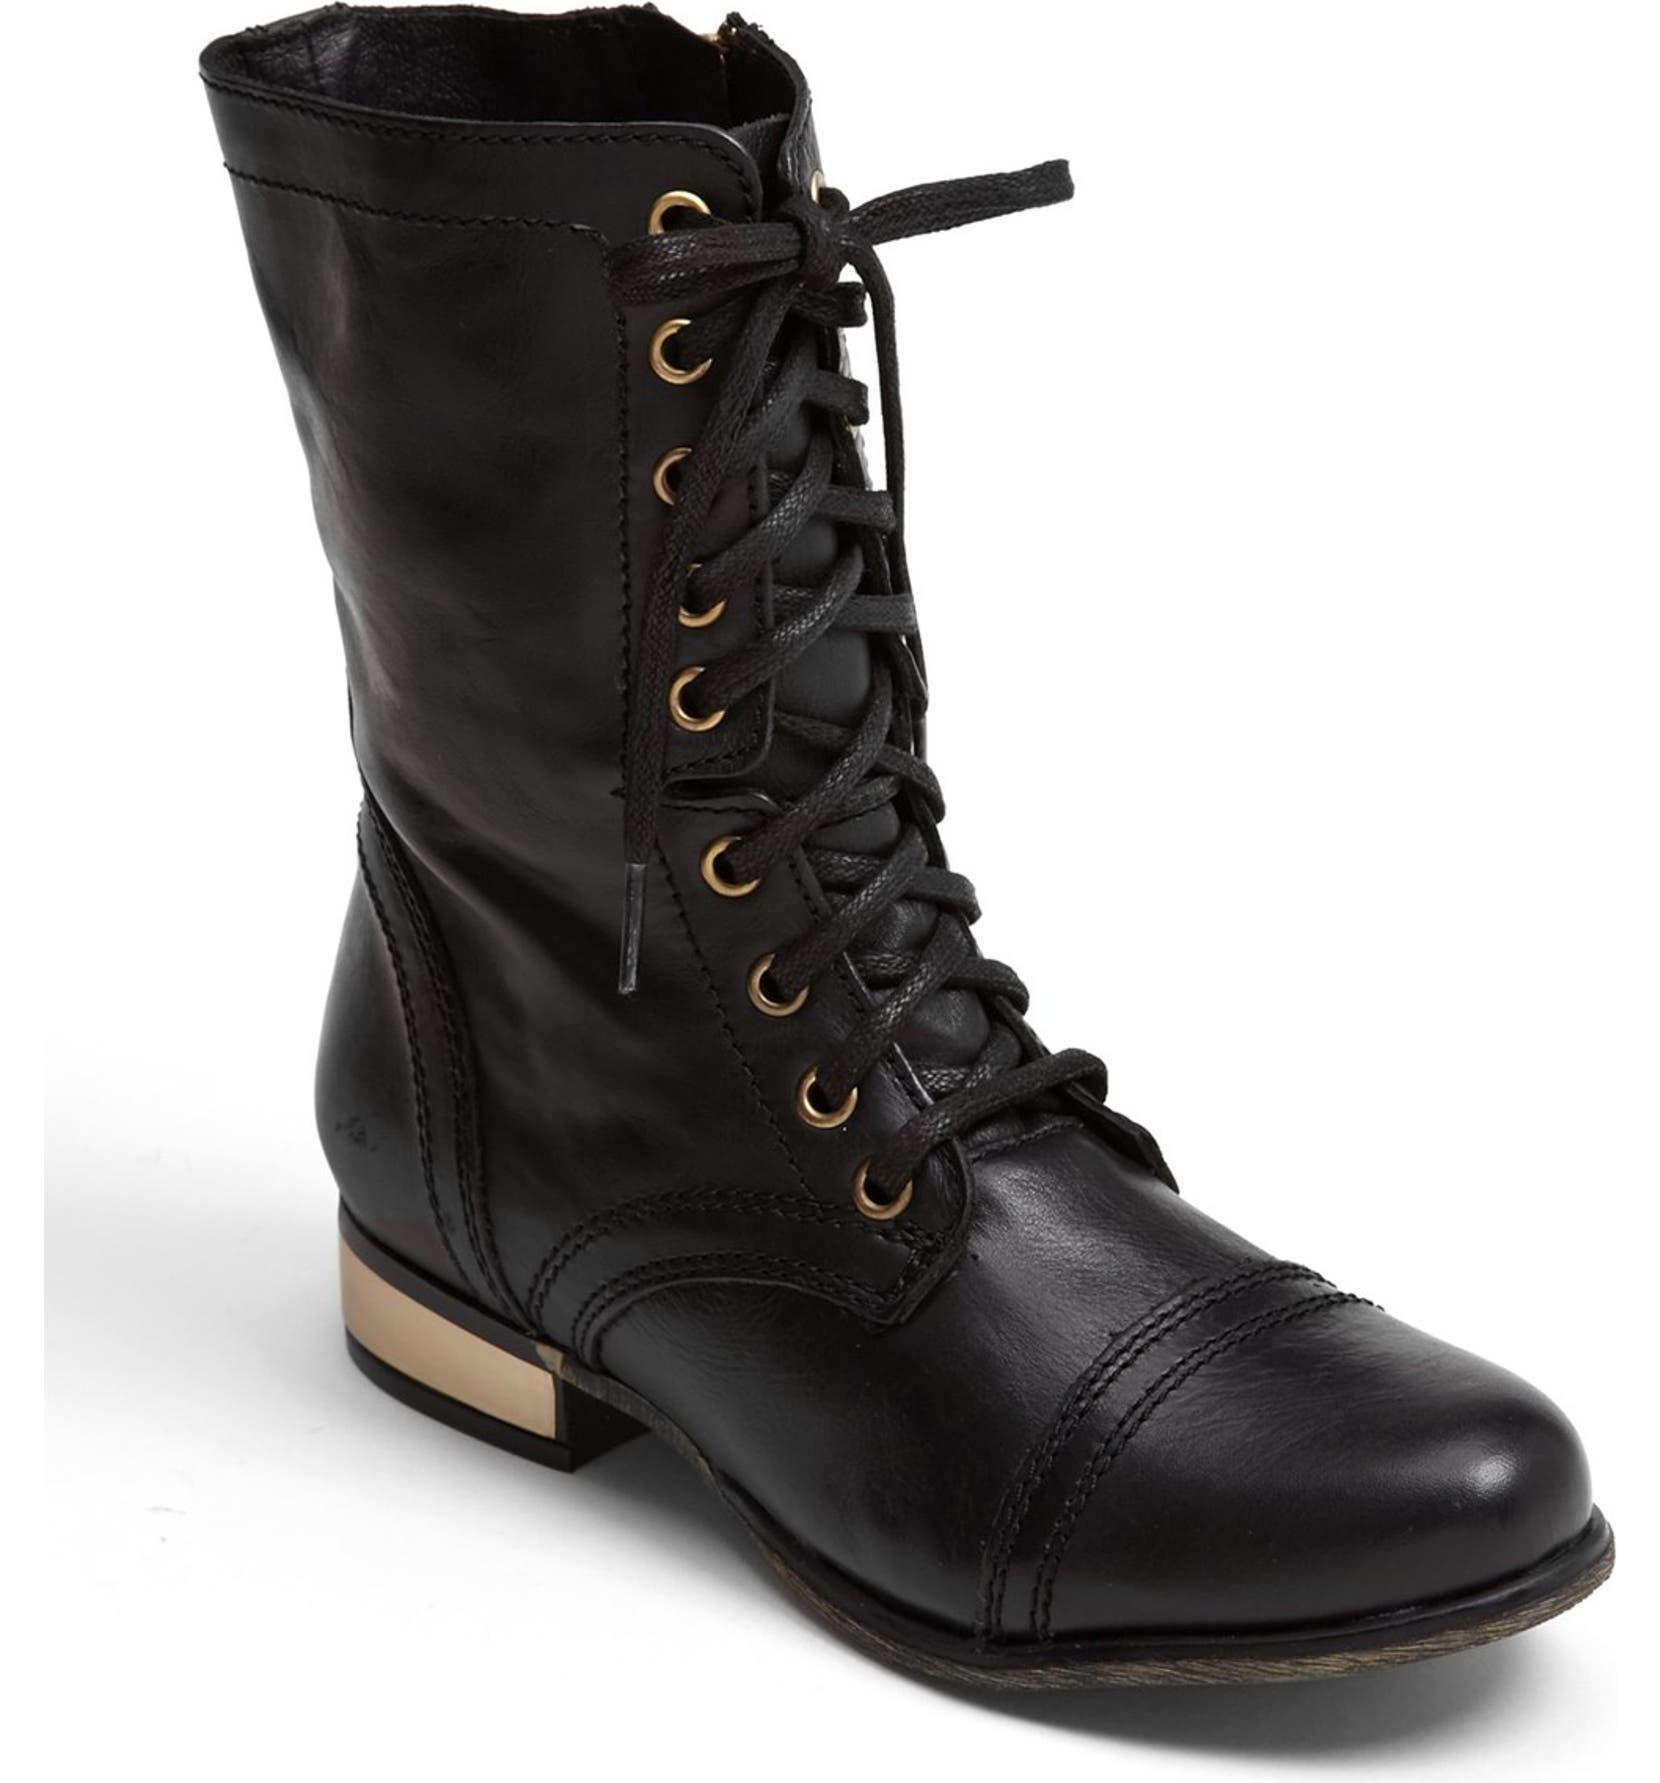 Steve madden shoes | troopa limited edition gunmetal | poshmark.